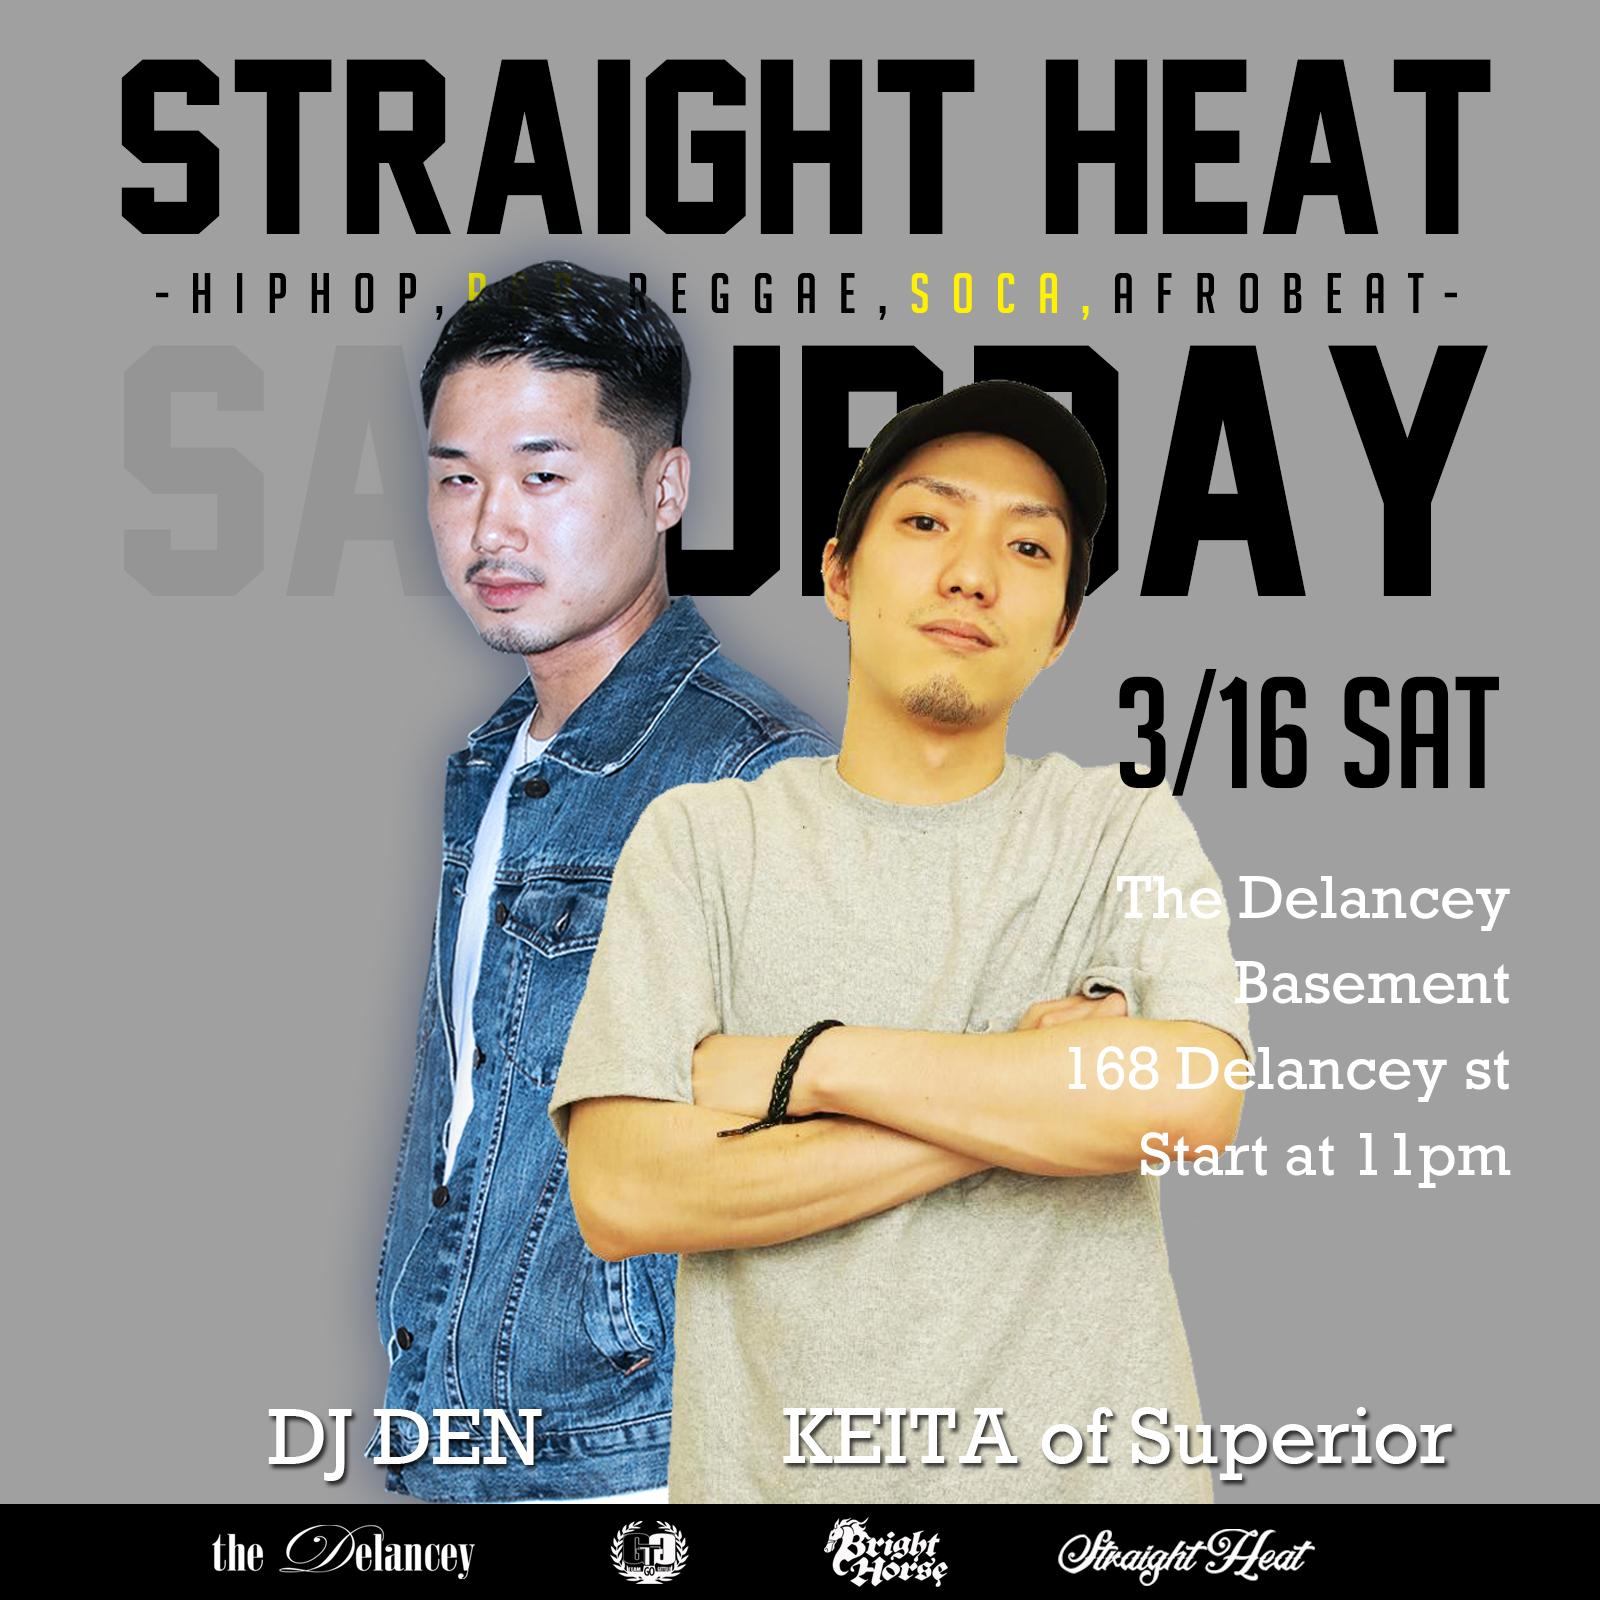 Straight-Heat-Saturday-Flyer316.jpg